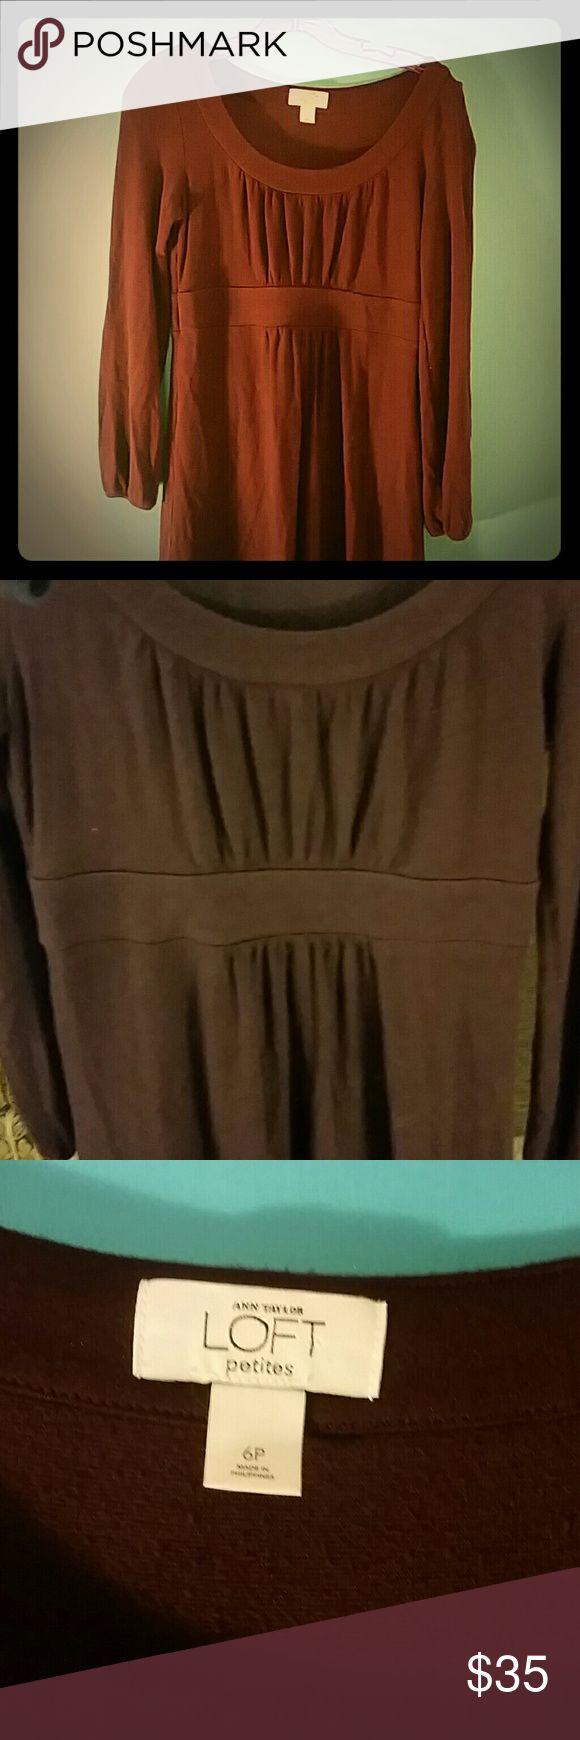 Anne Taylor LOFT plum colored long sleeve dress Anne Taylor LOFT dress. Empire waist, long sleeves, beautiful plum color, size 6P, very good condition. LOFT Dresses Long Sleeve